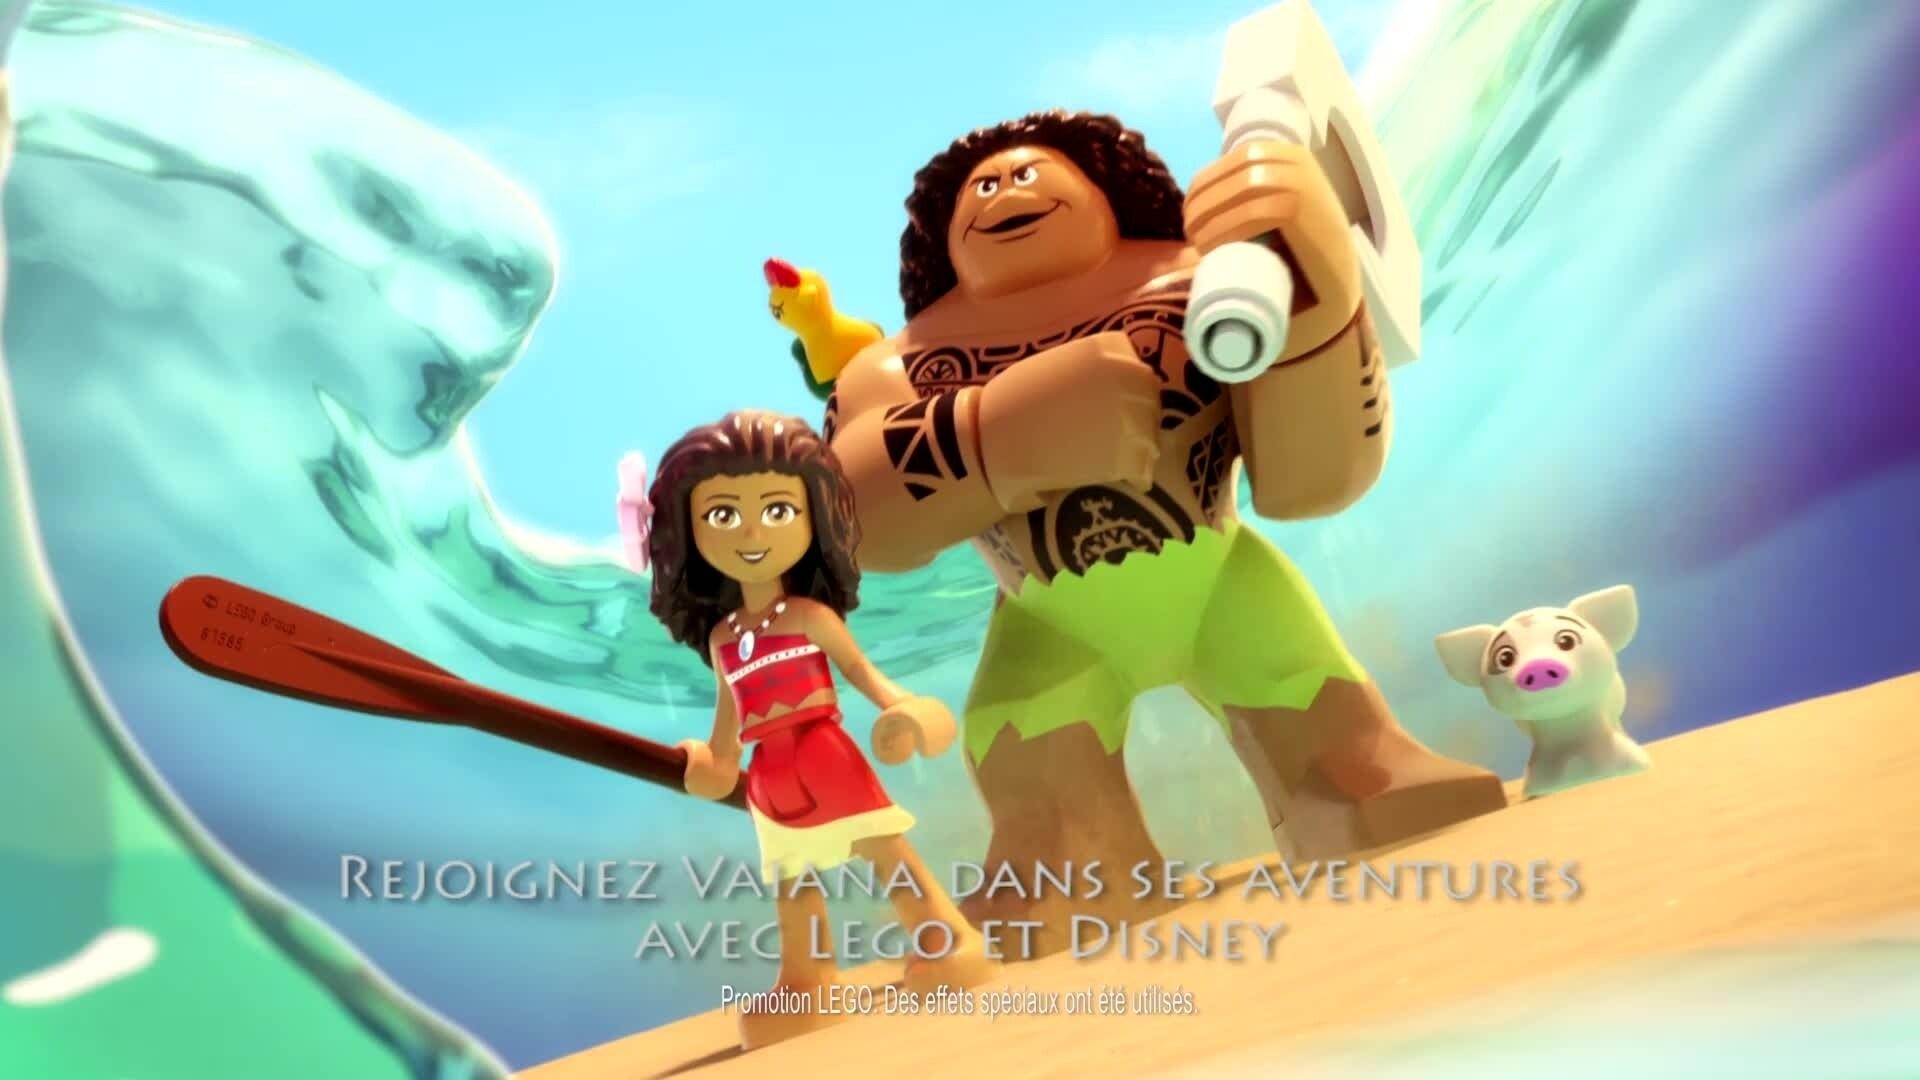 LEGO® Disney & Vaiana Aventure